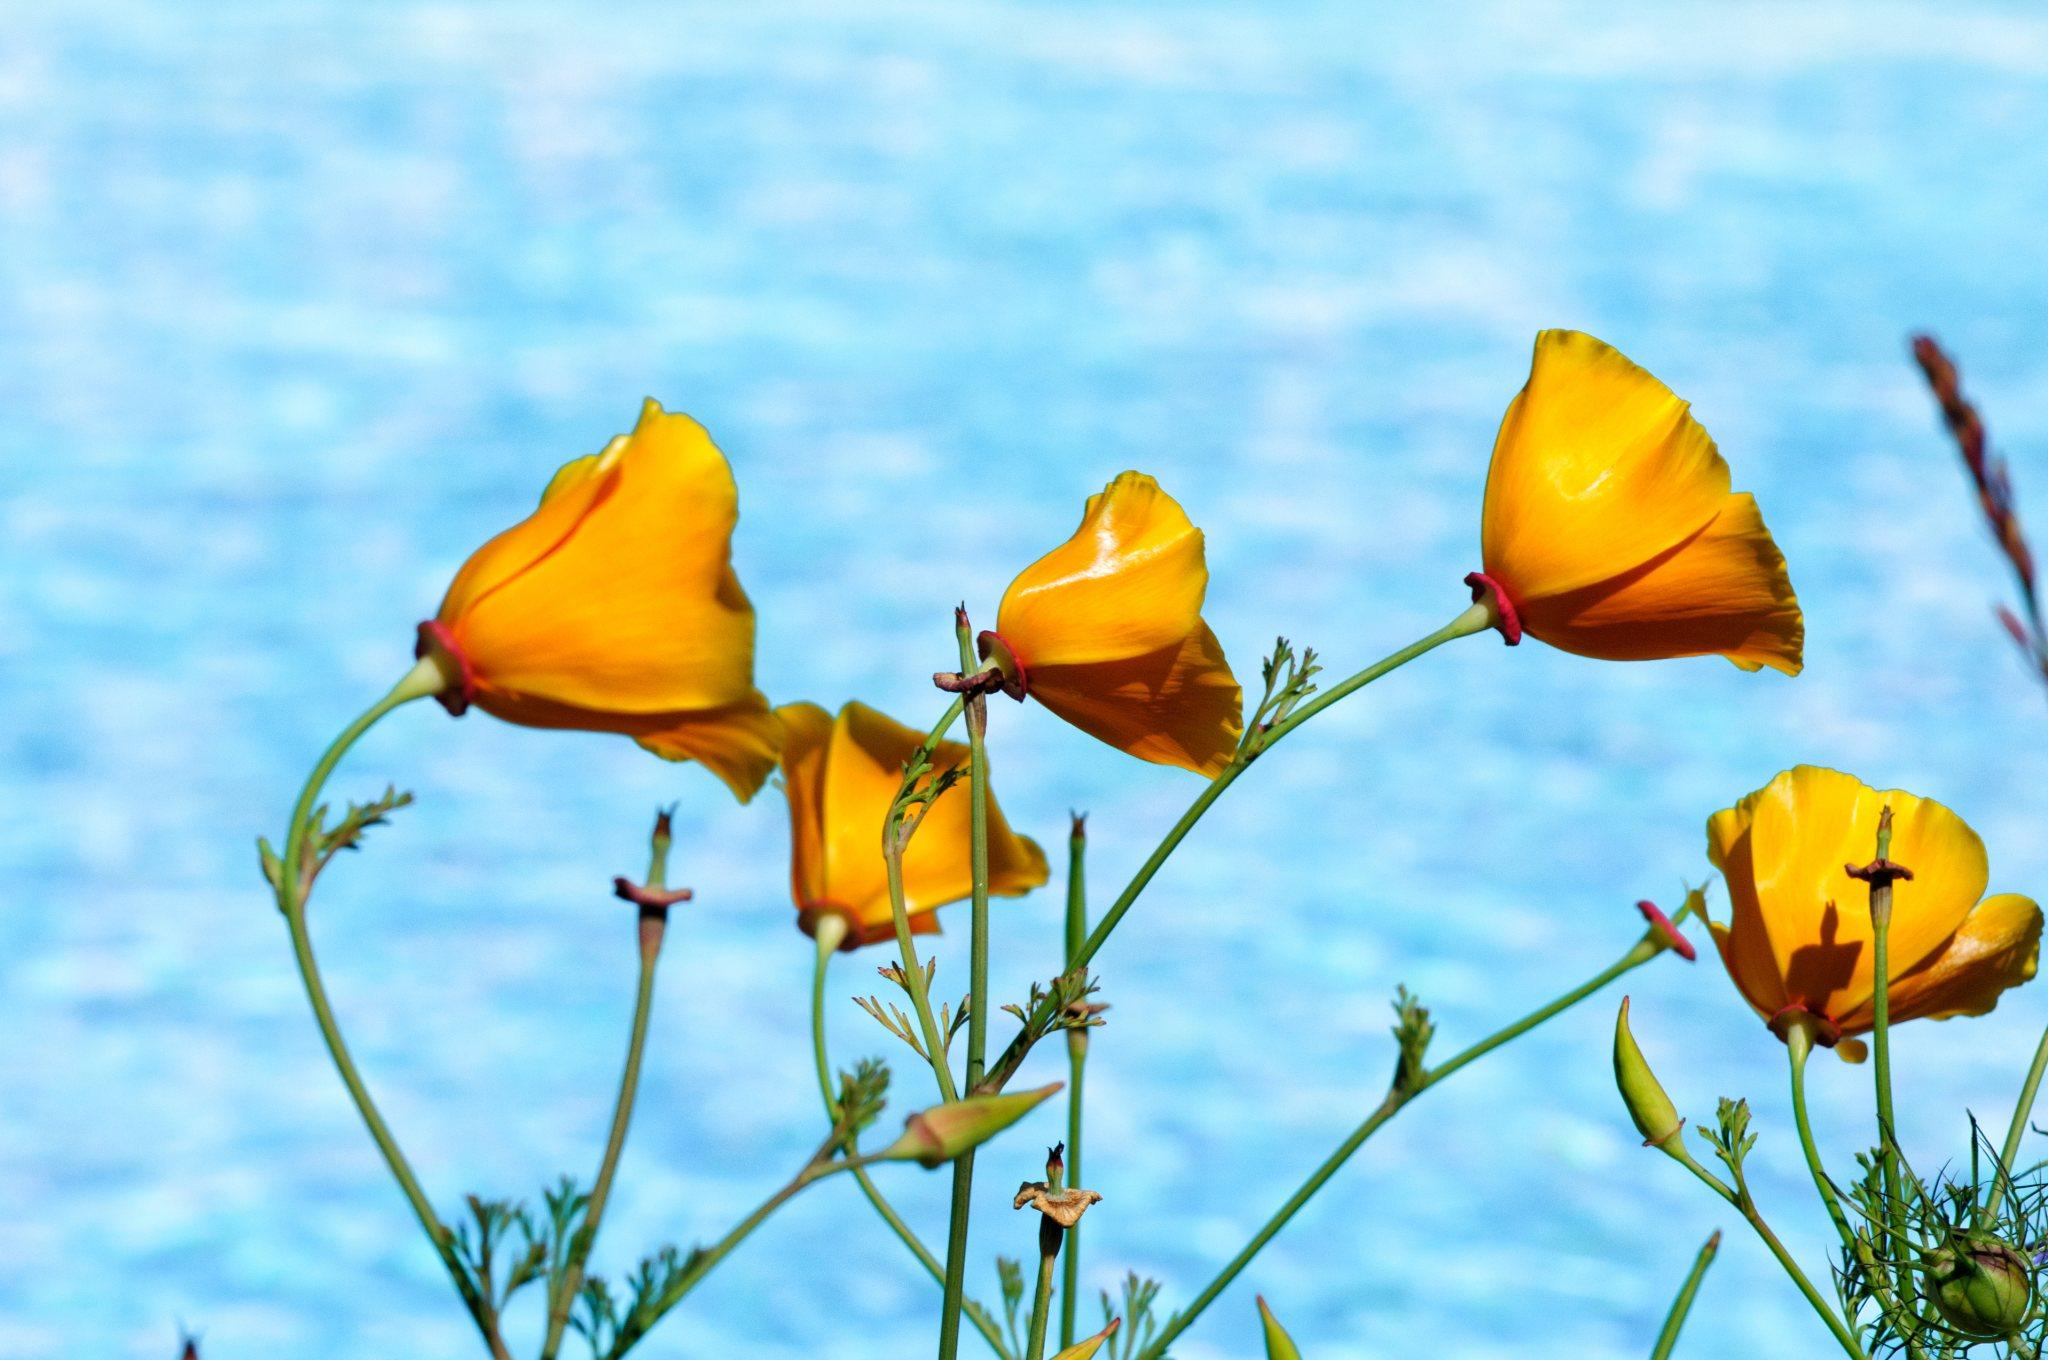 bronces_fleurs-17.jpg